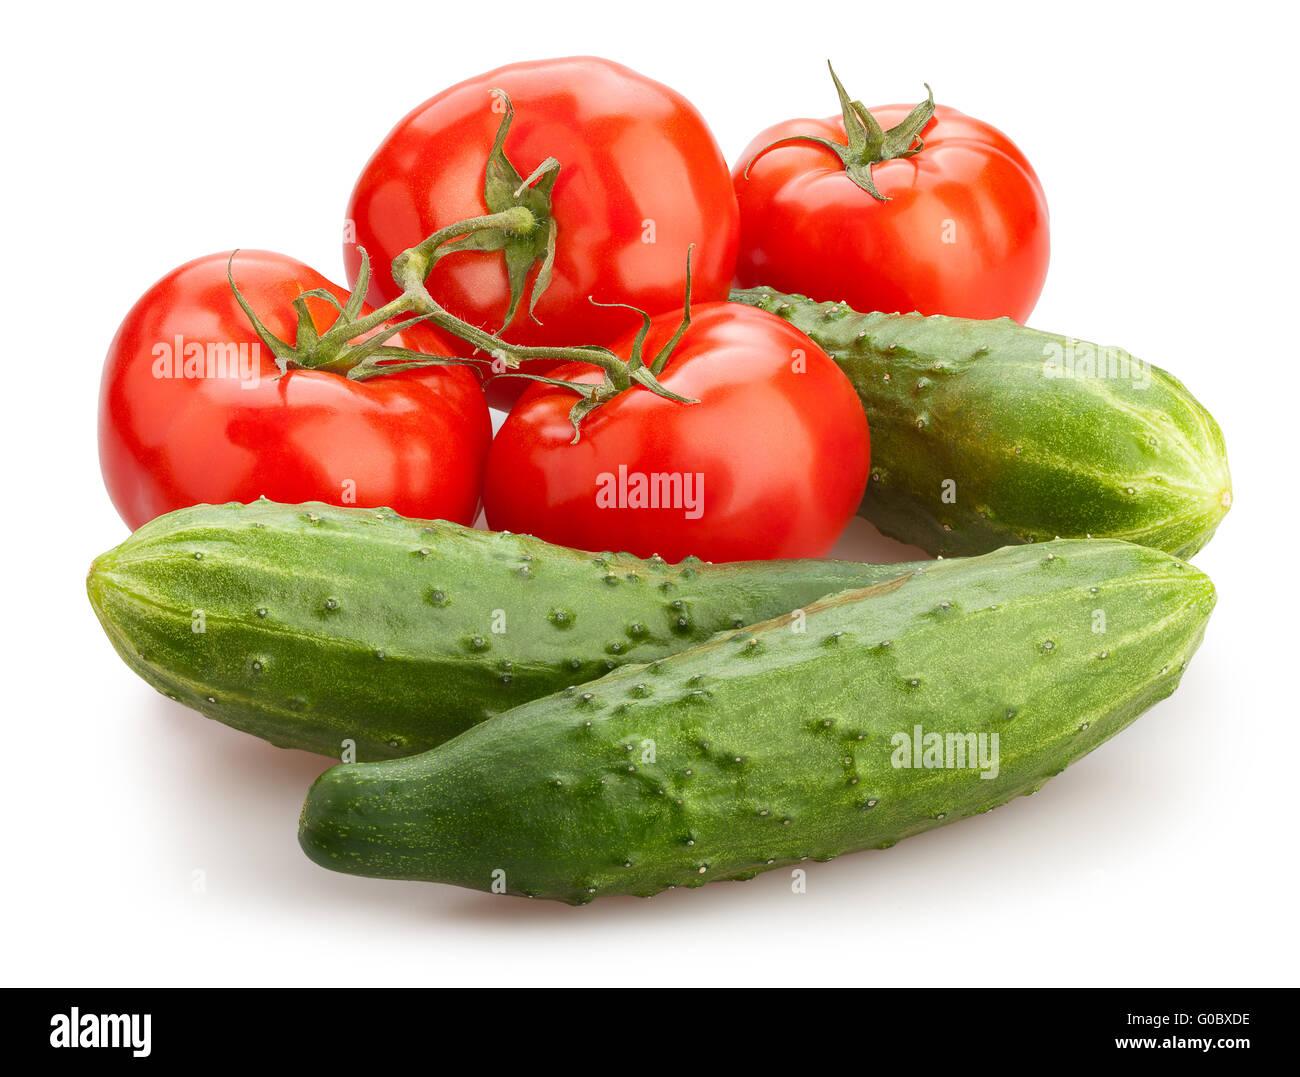 Tomates rojos aislados de mezcla de pepino Imagen De Stock